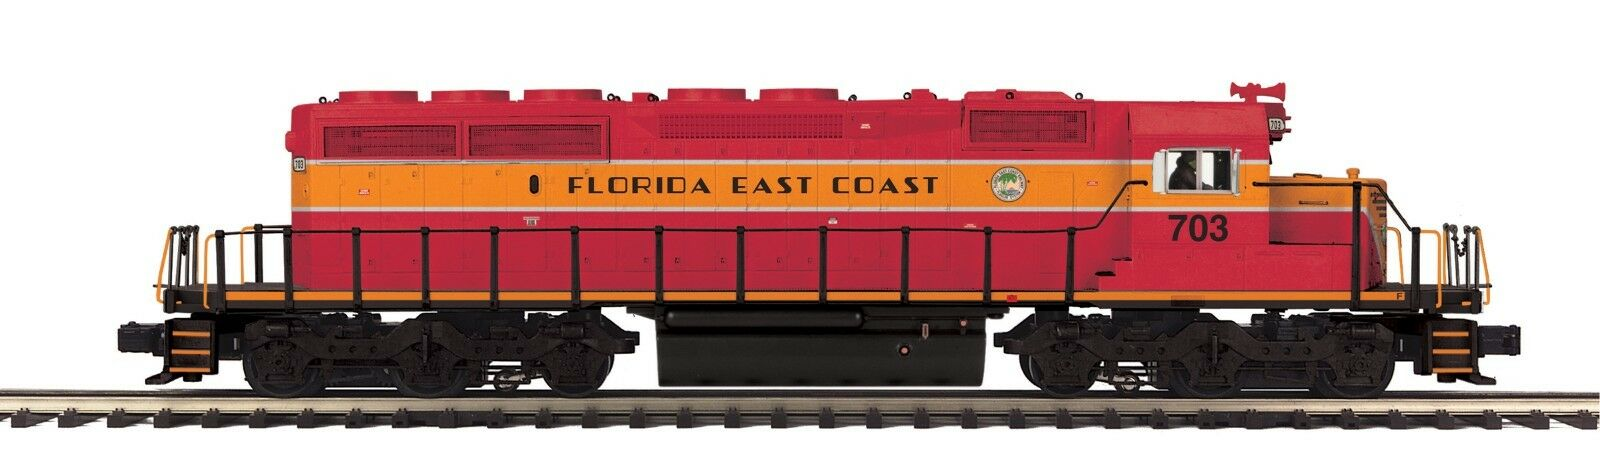 MTH 20-20993-1 FLORIDA EAST COAST  FEC  SD40-2 RD NO. 703 PredOSOUND 3.0 HI RAIL